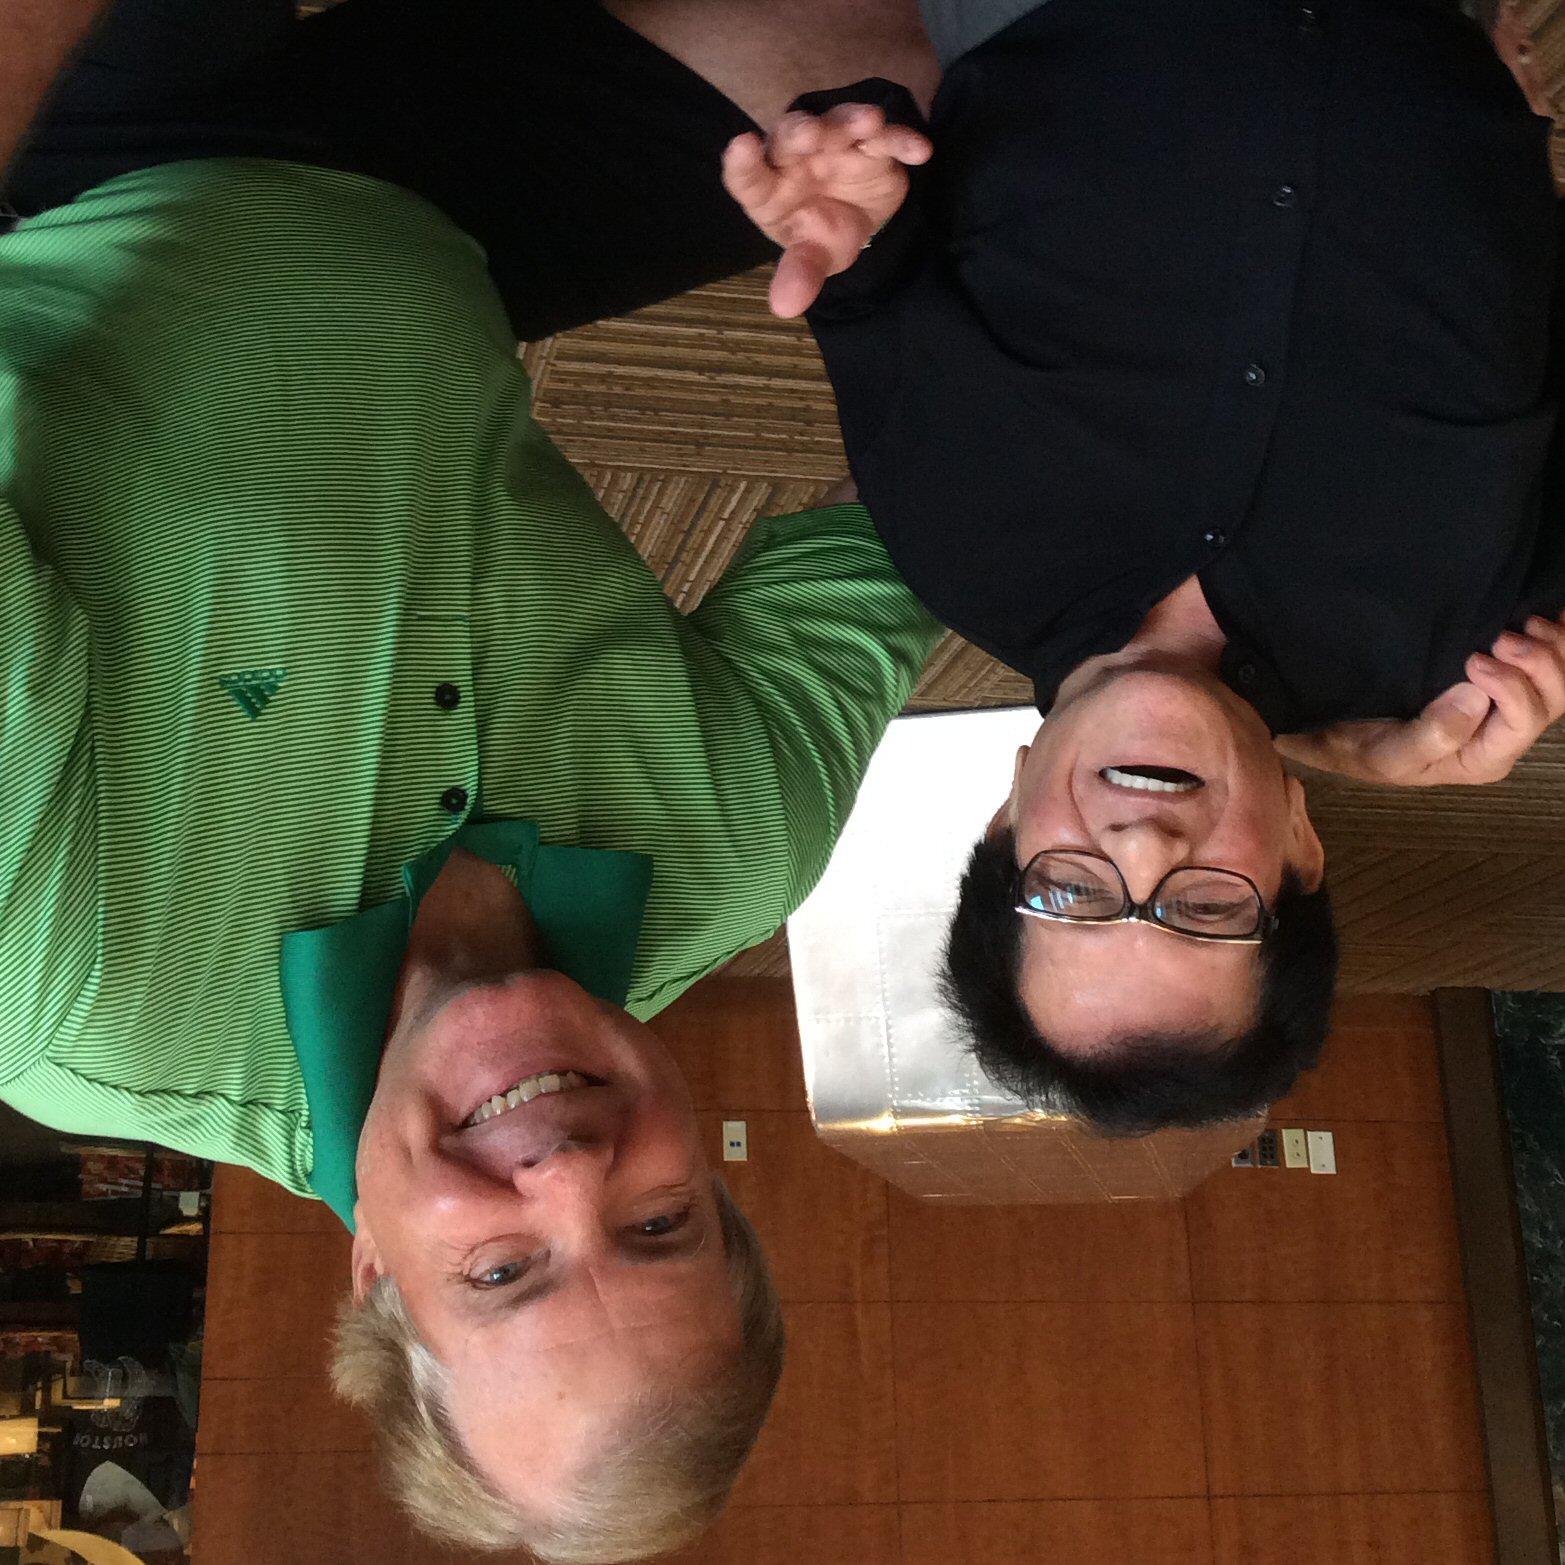 Antonio Hoyos and Scott Wells